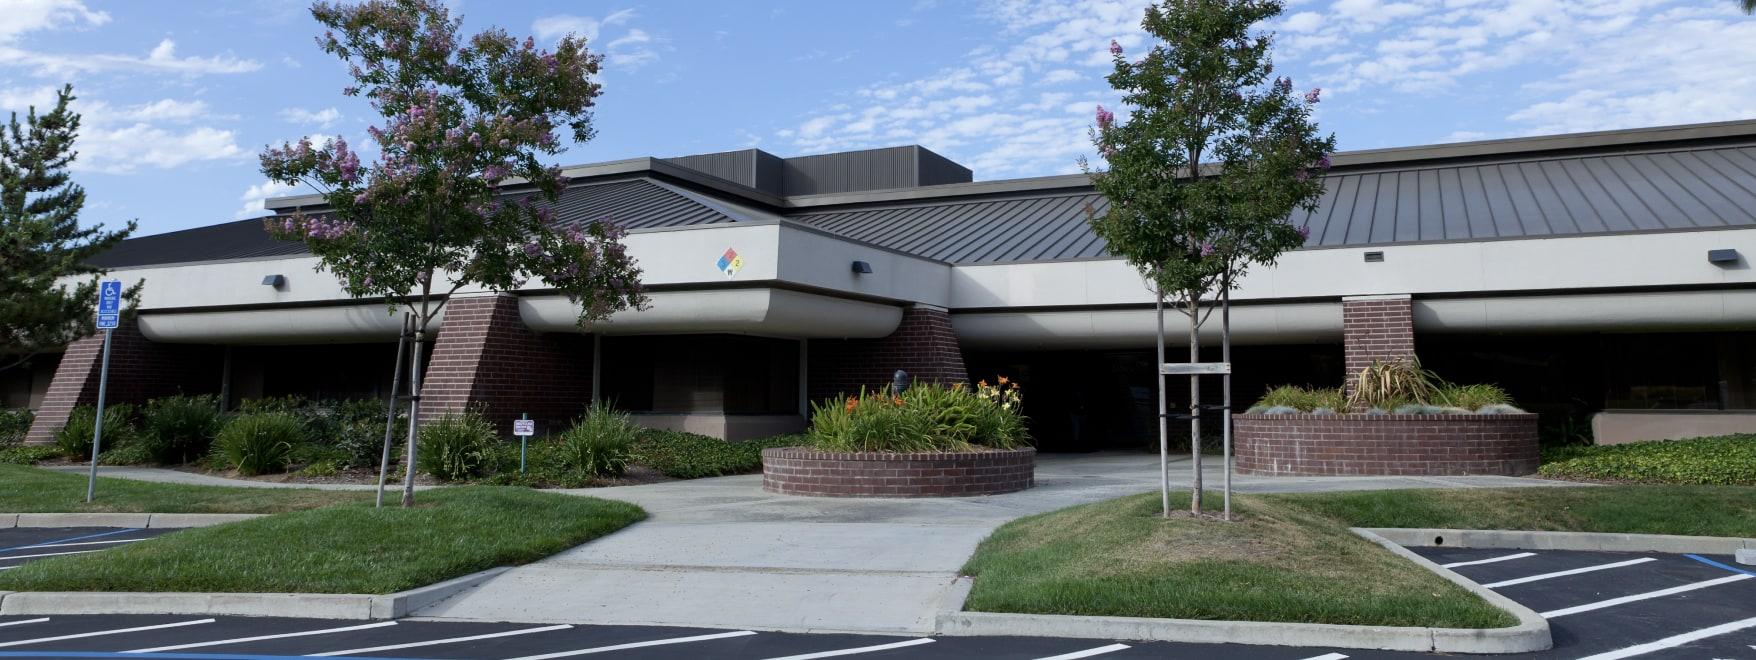 Silicon Valley Data Center (SV2) Milpitas, CA